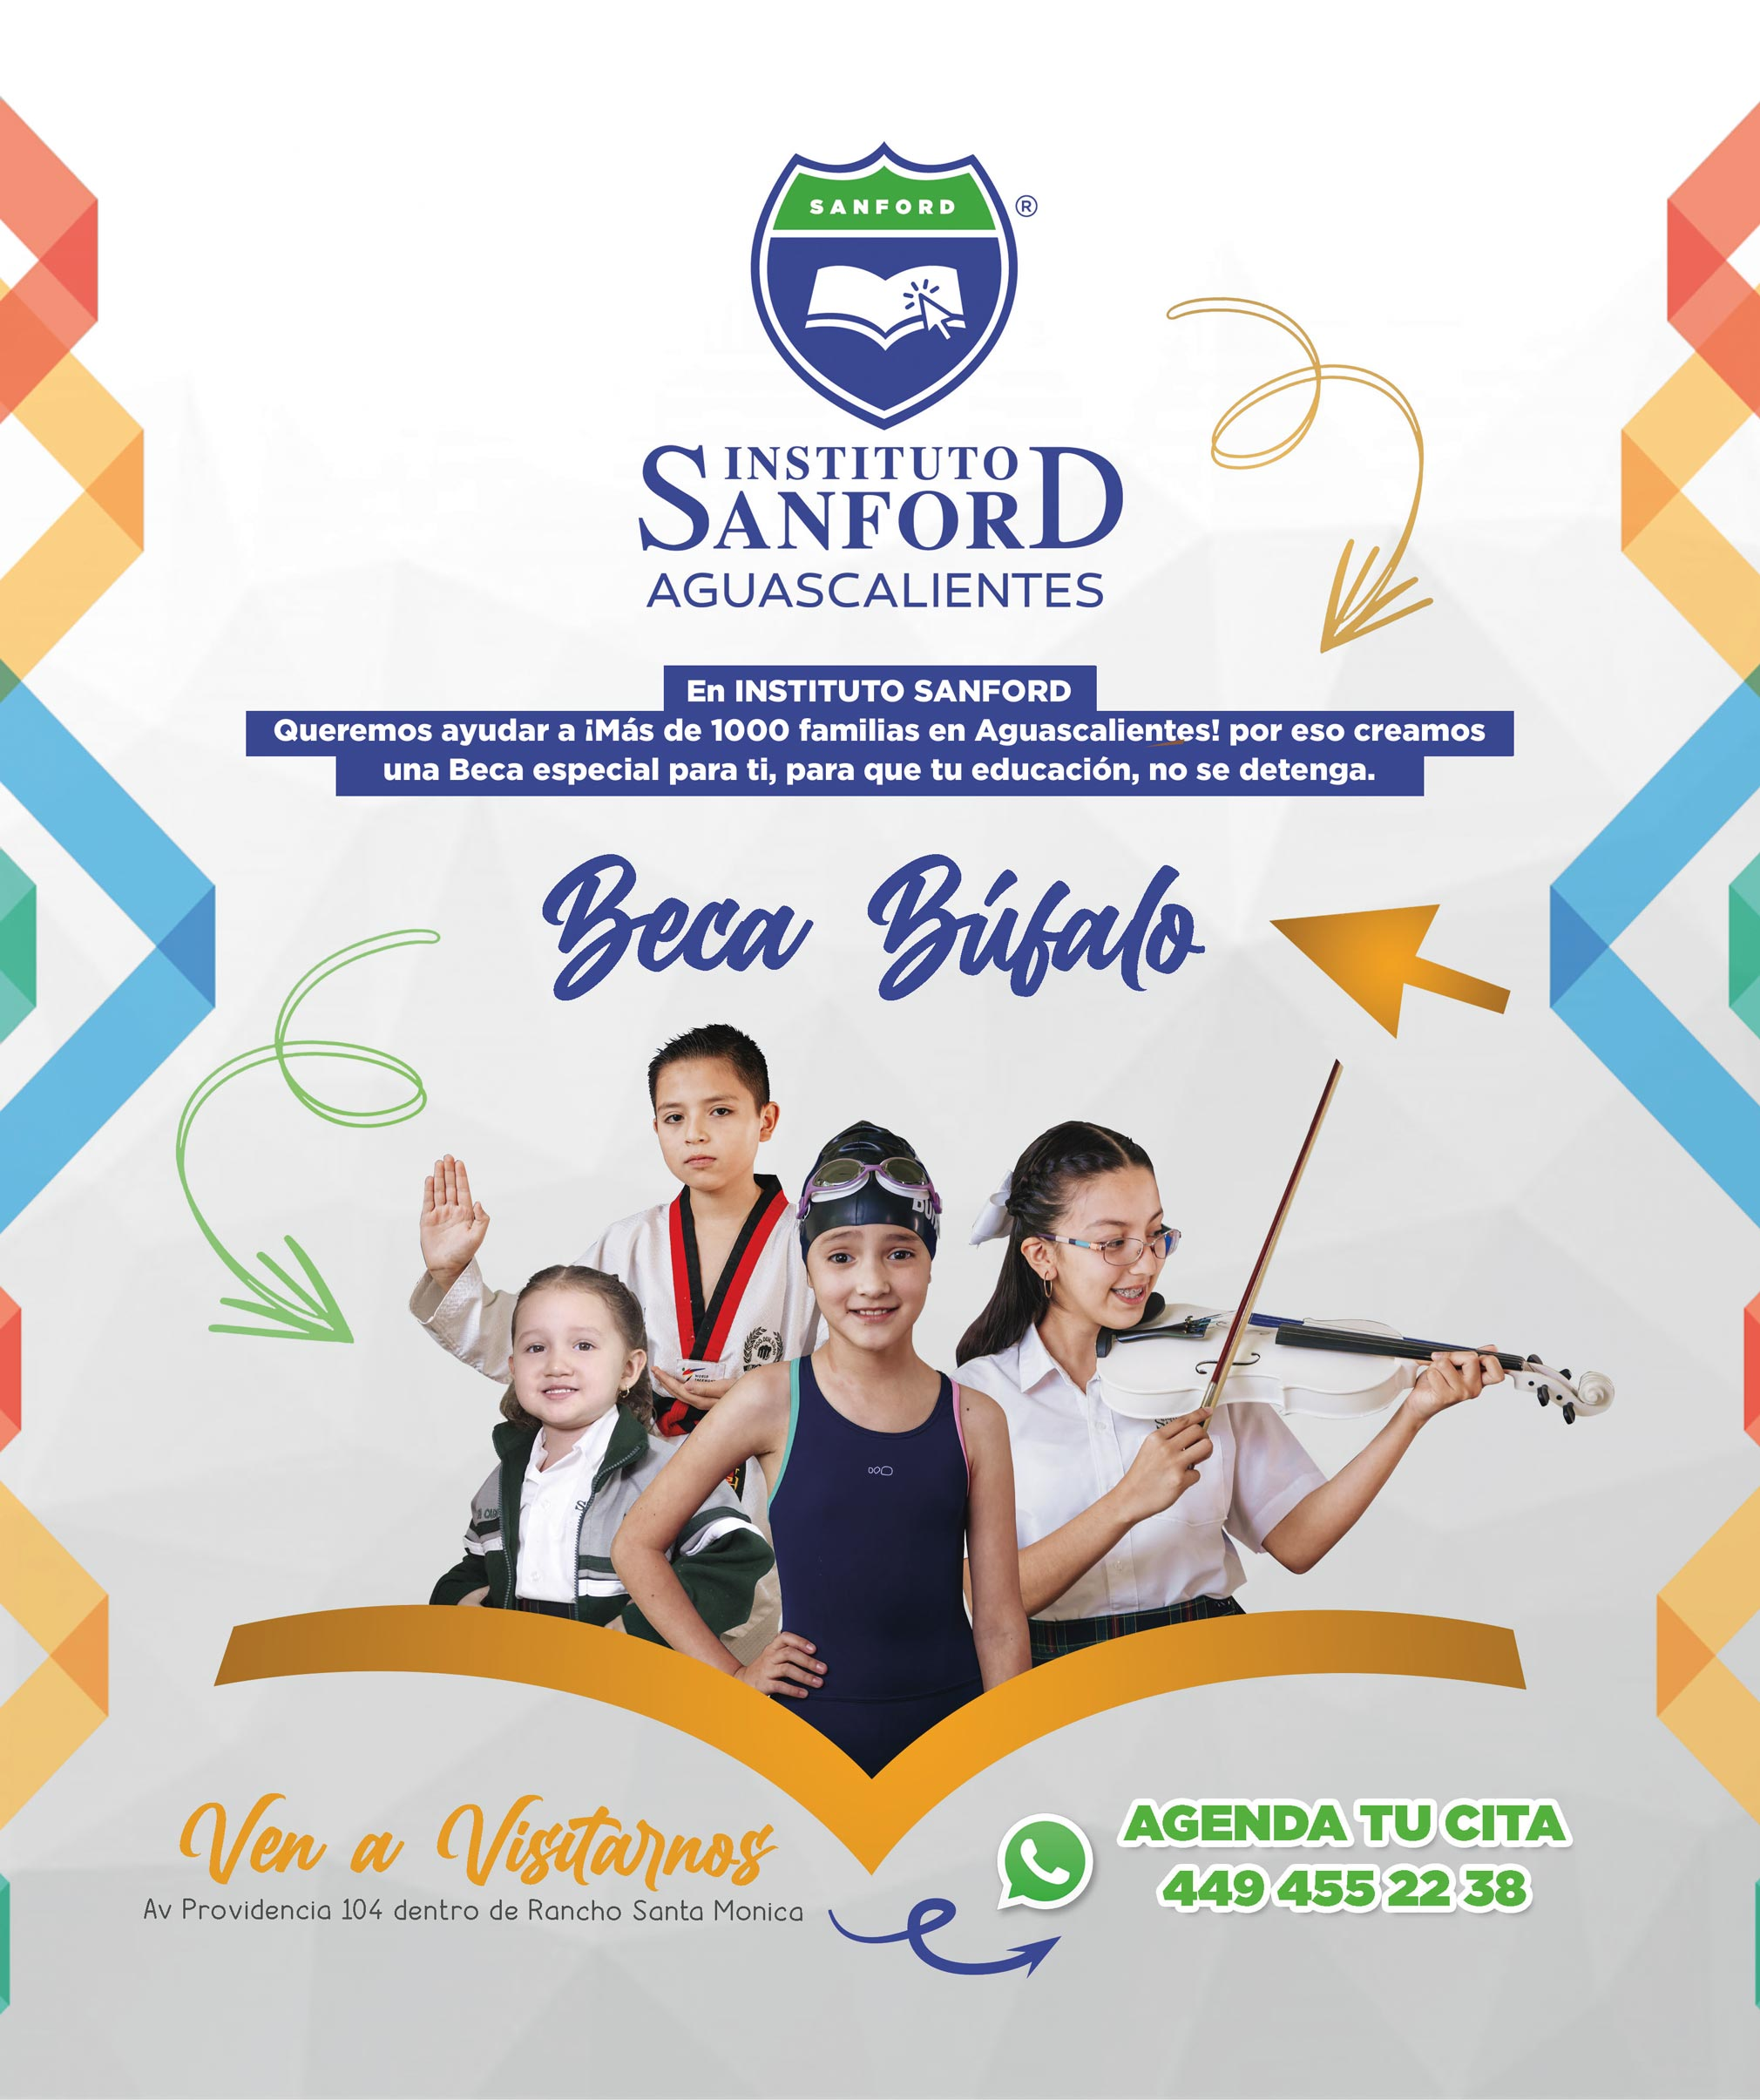 SANFORD_2FORROS